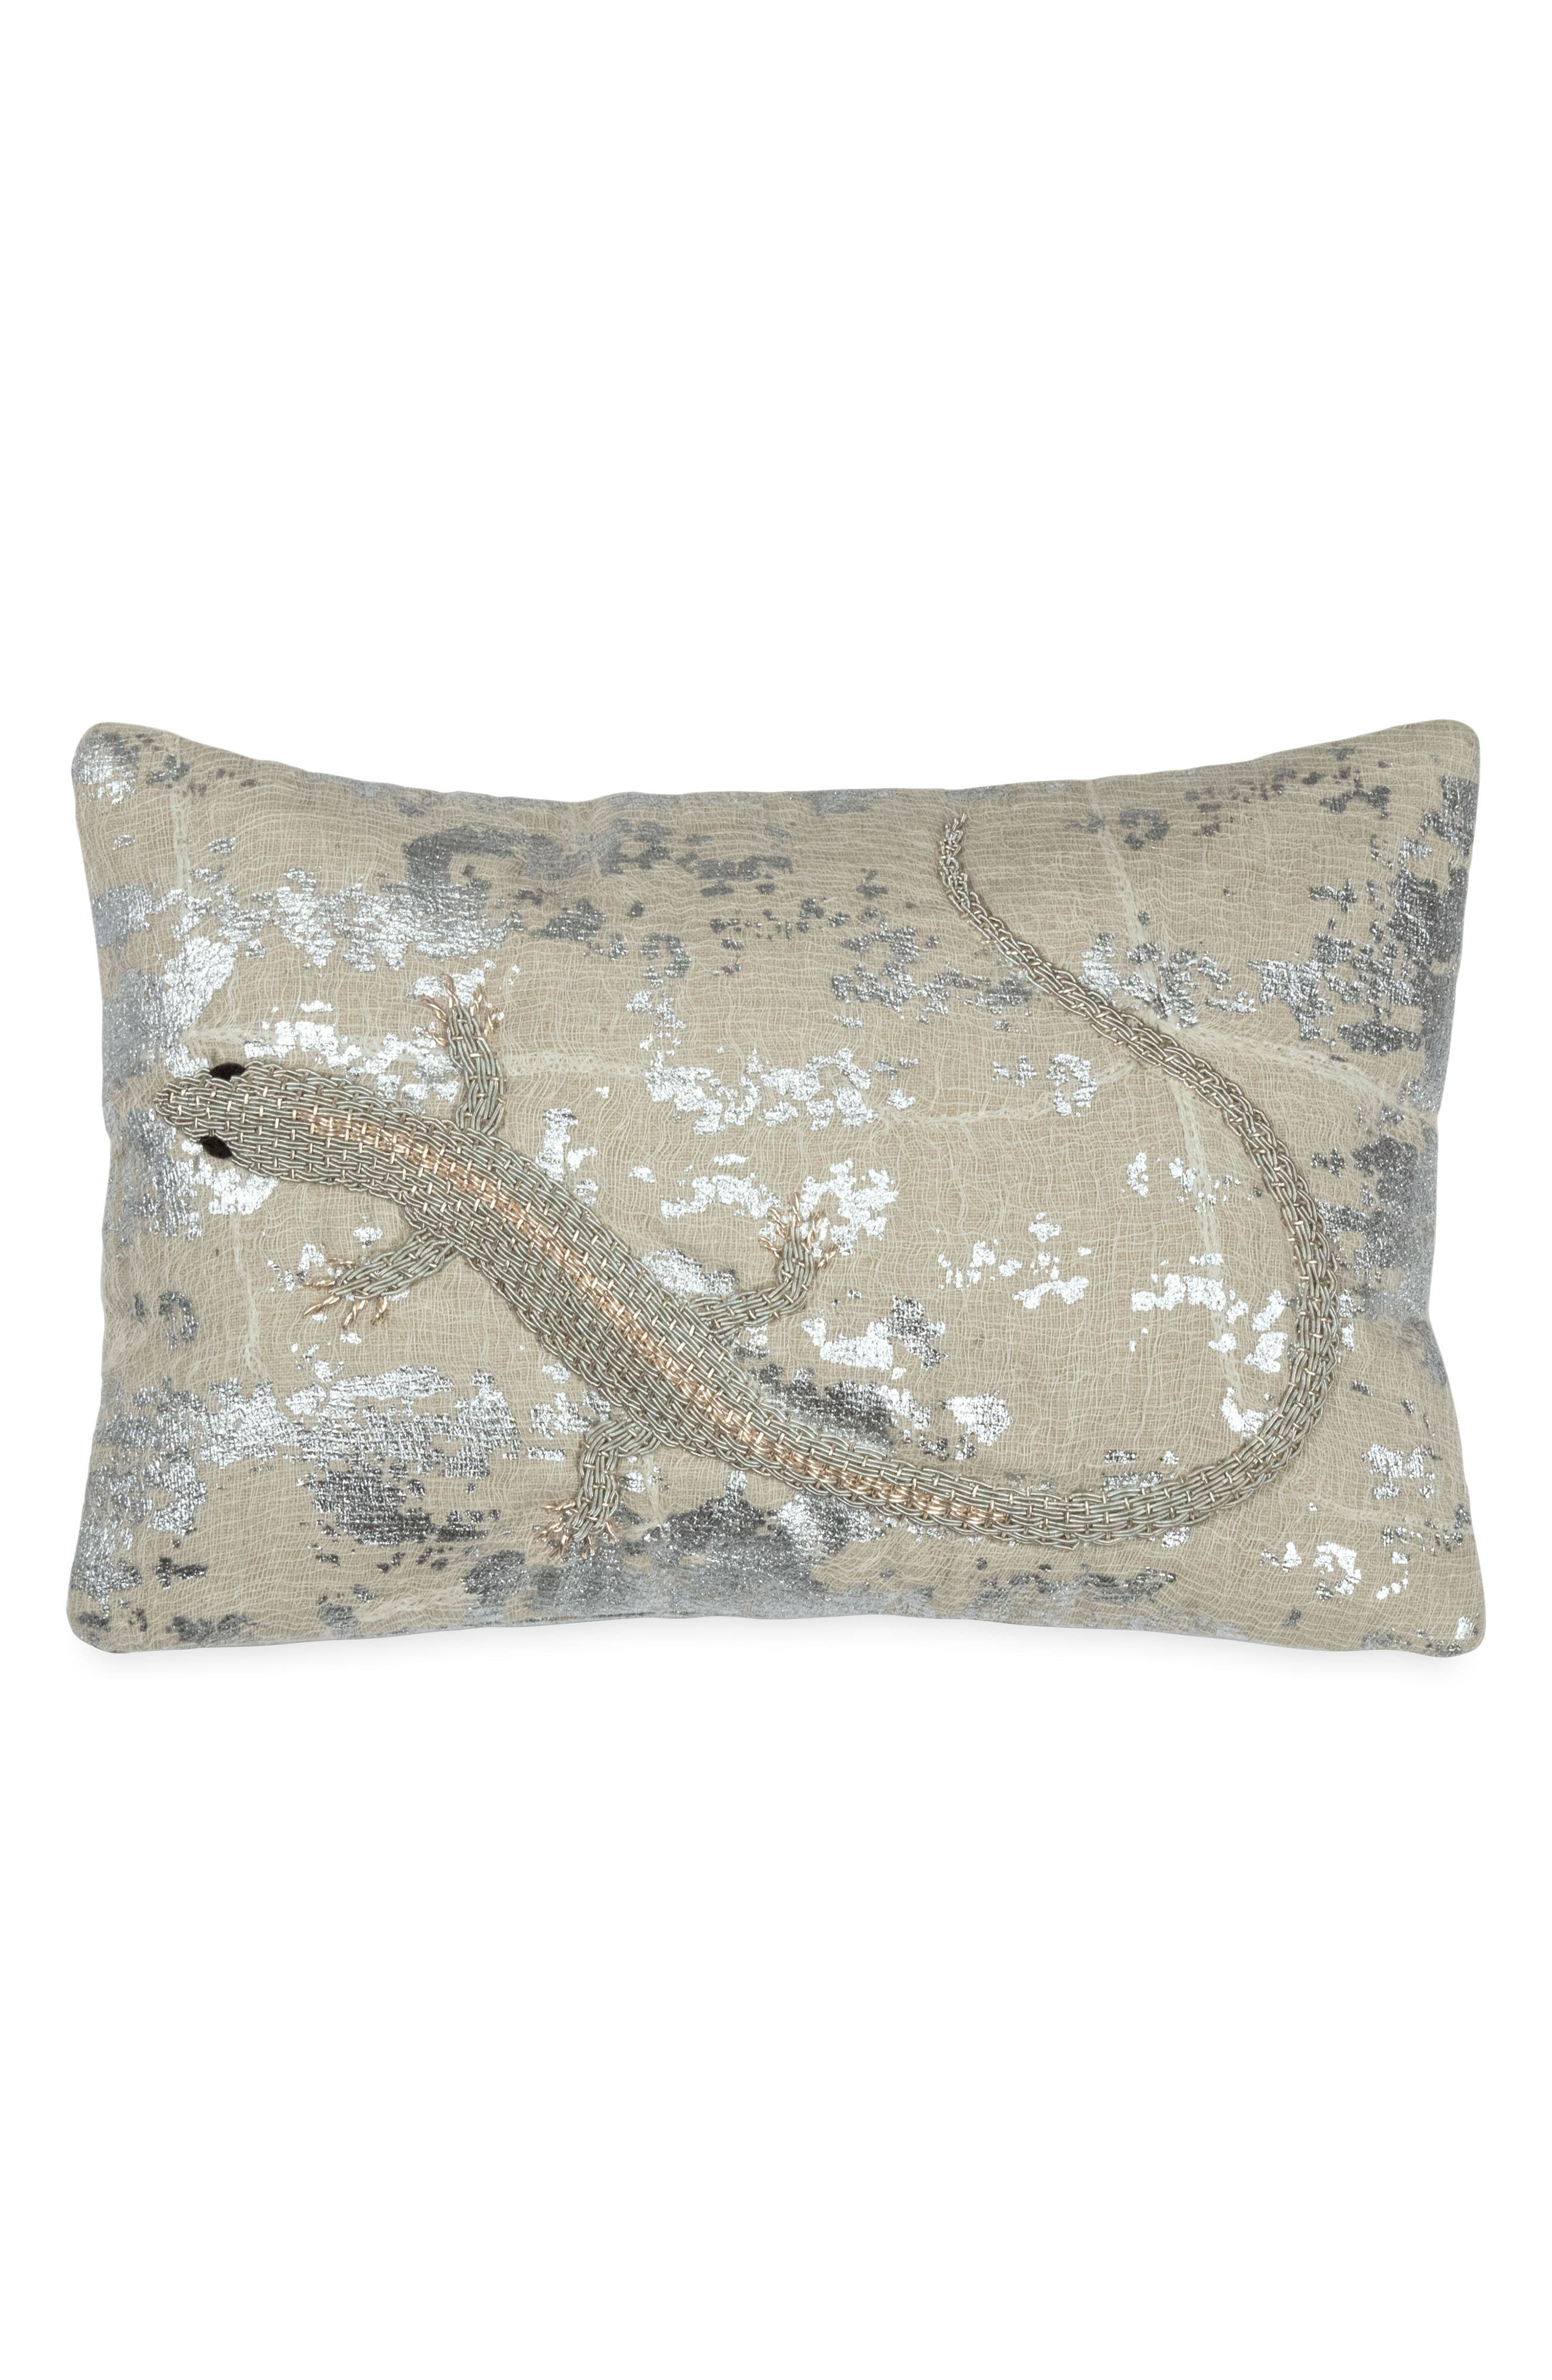 MICHAEL ARAM Lizard Embroidered Decorative Pillow, Main, color, SILVER